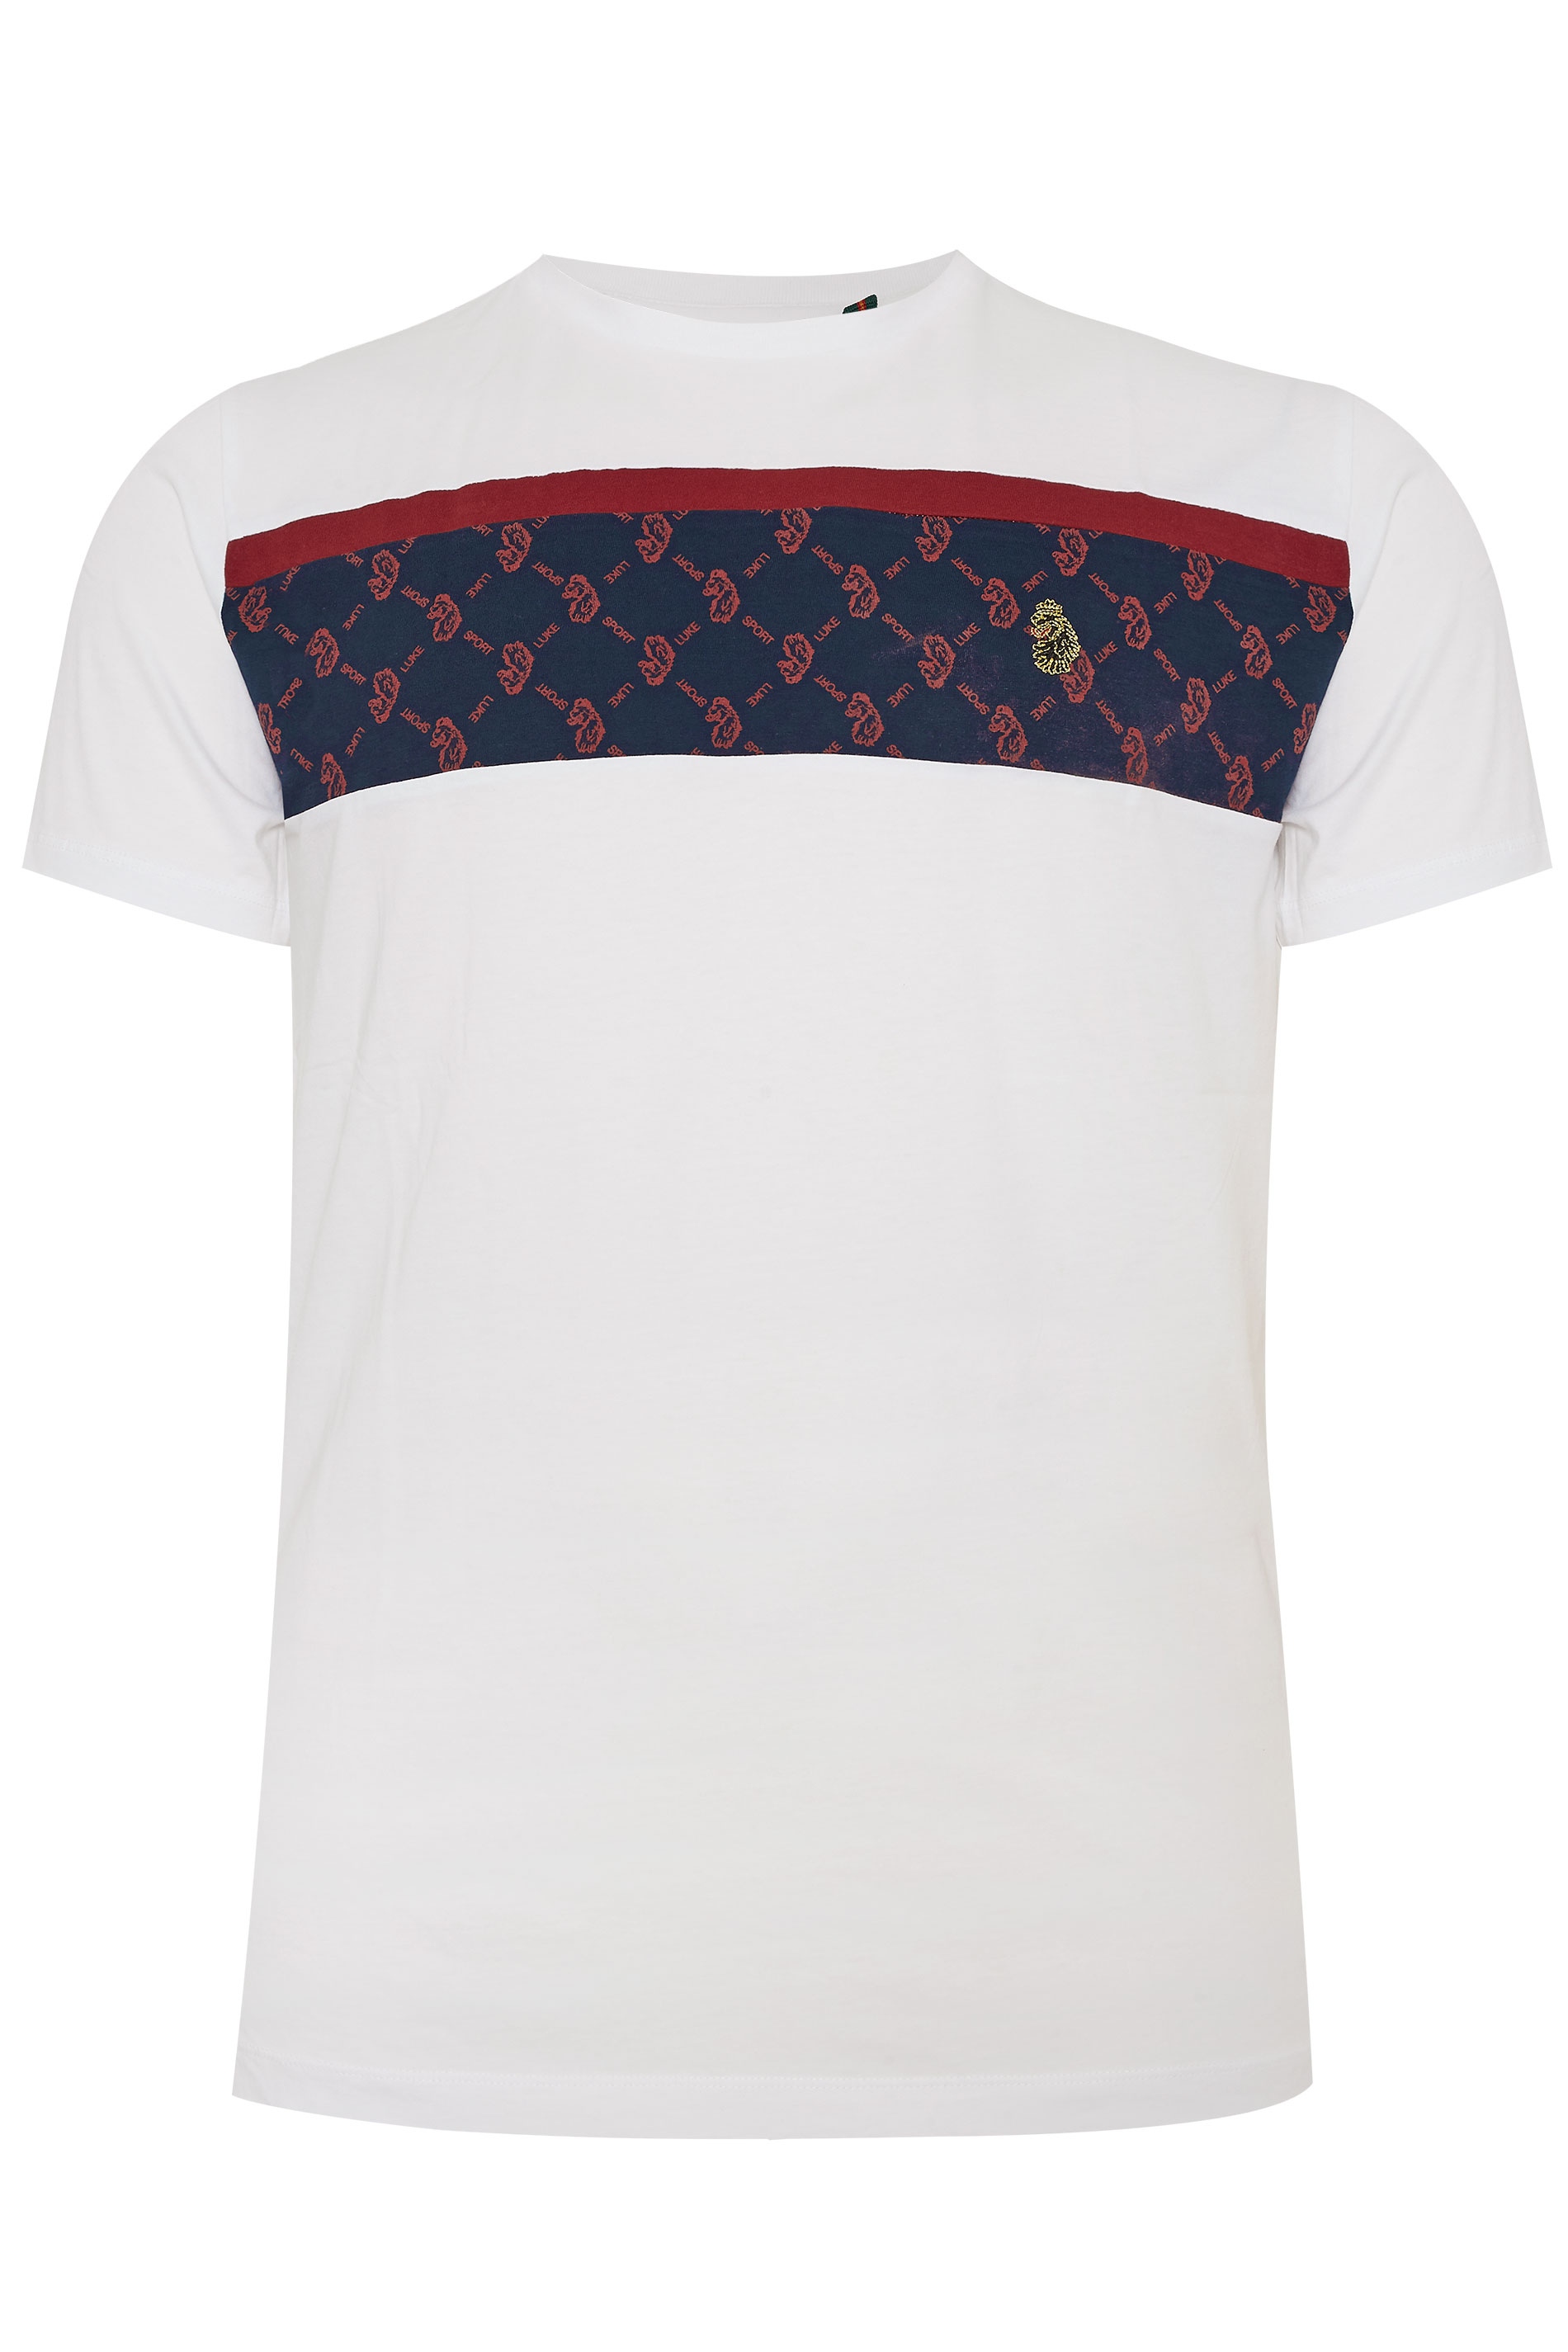 LUKE 1977 - Sport Lions t-shirt van katoen in wit